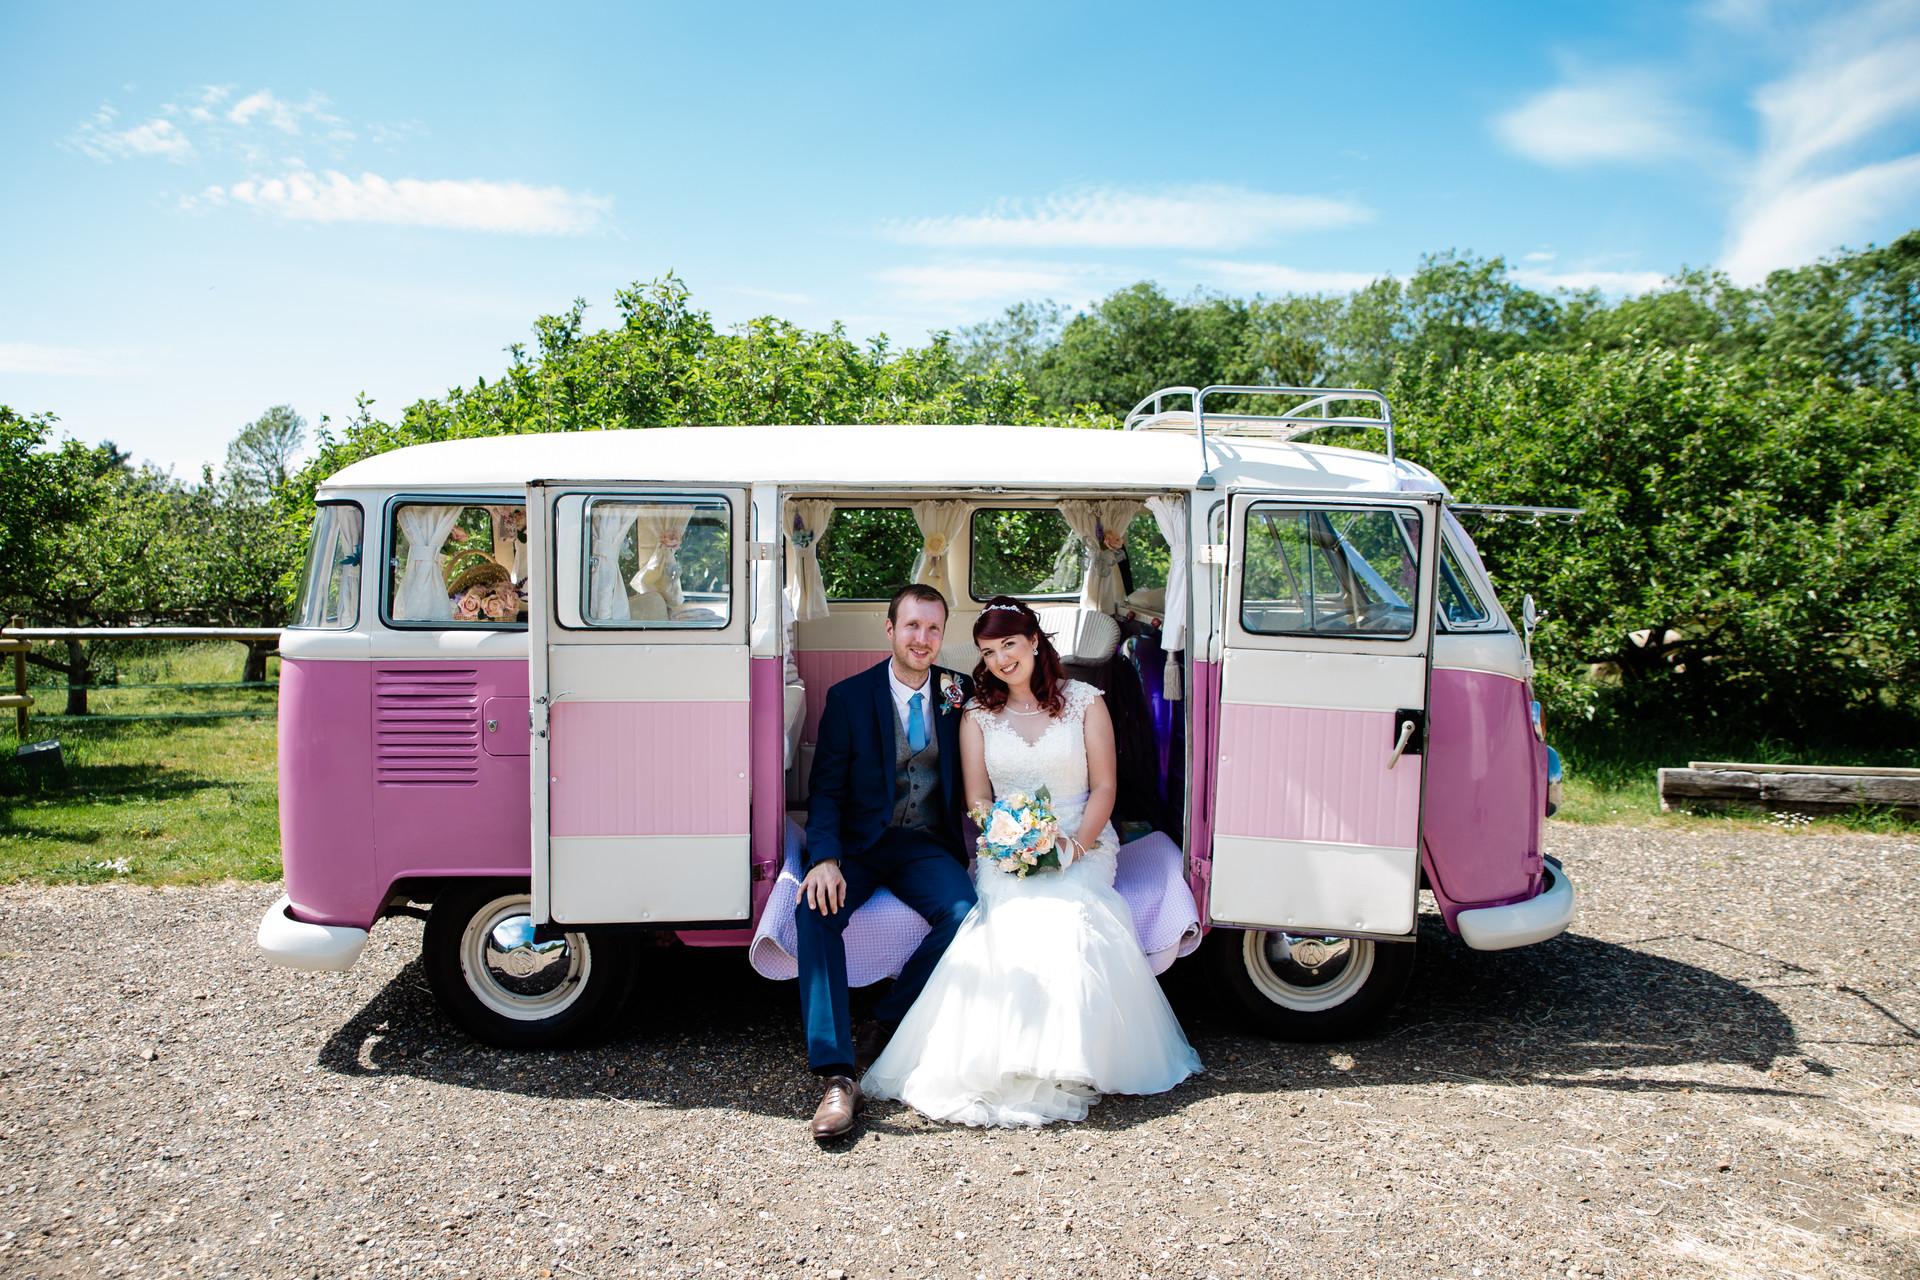 Apple Farm Wedding Isle of Wight